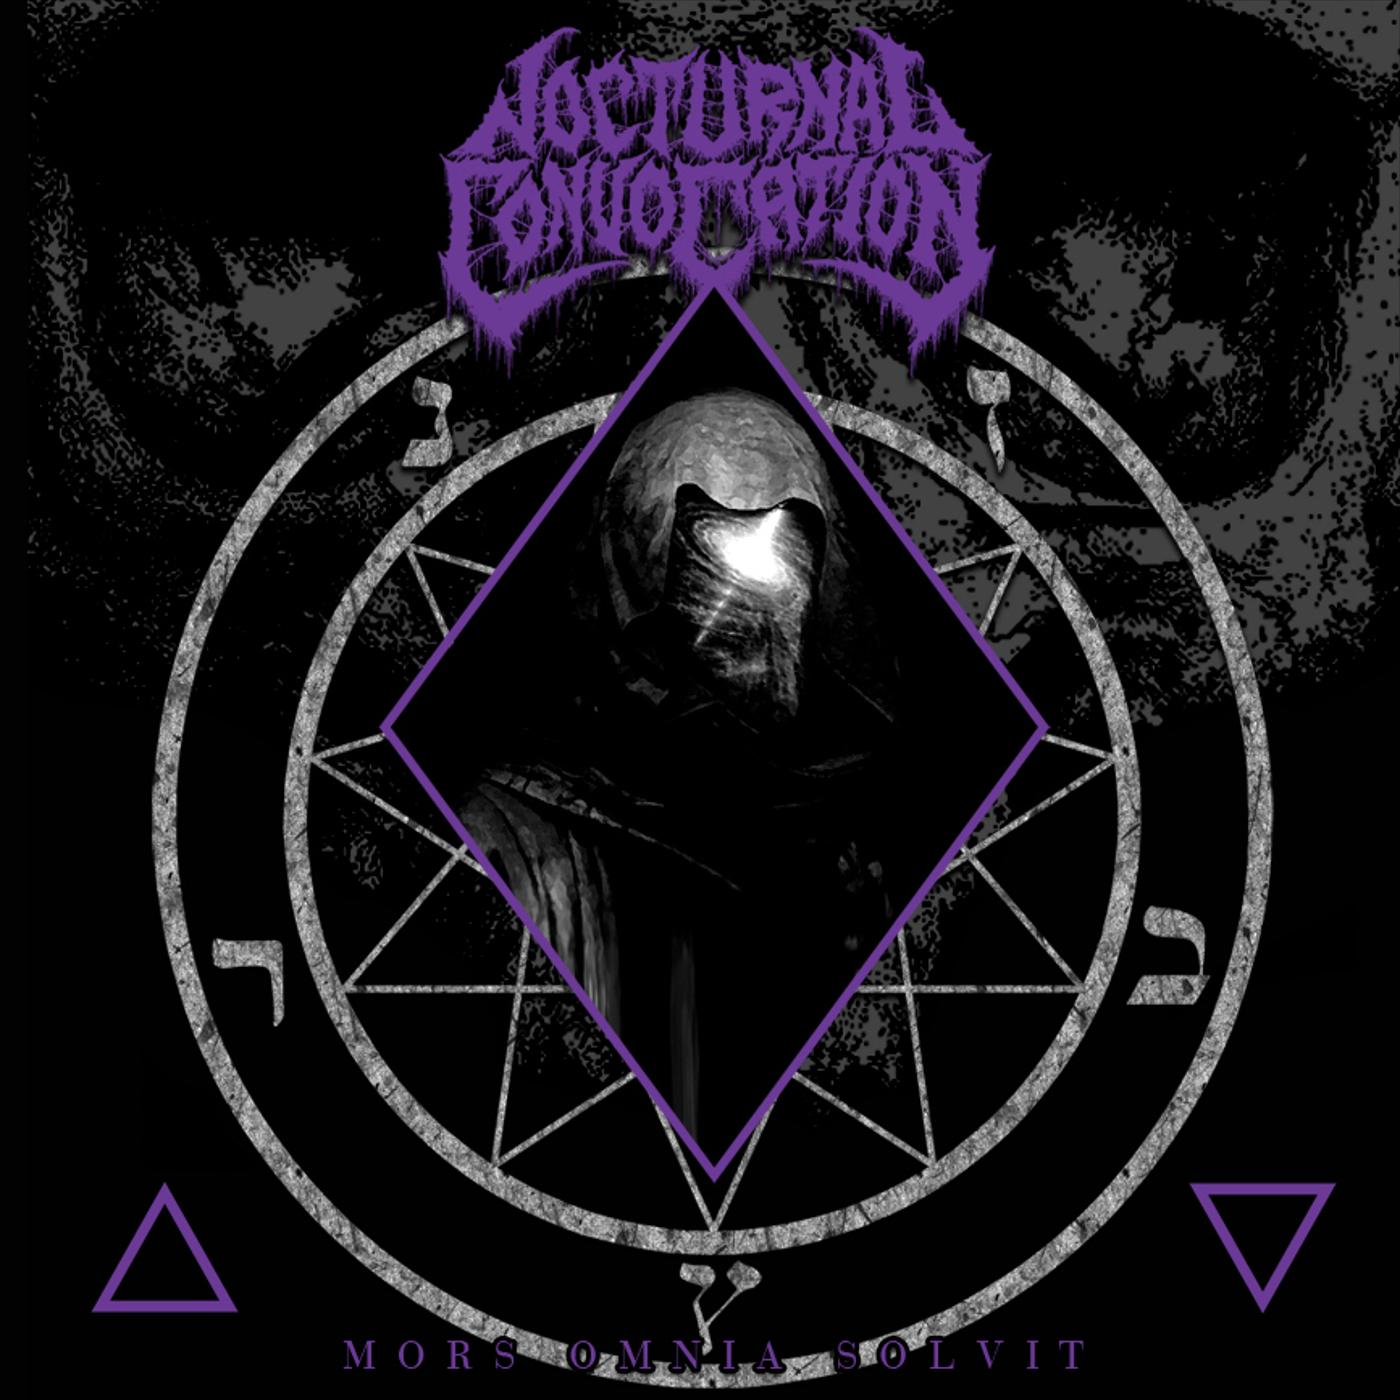 nocturnal-convocation-Mors-Omnia-Solvit